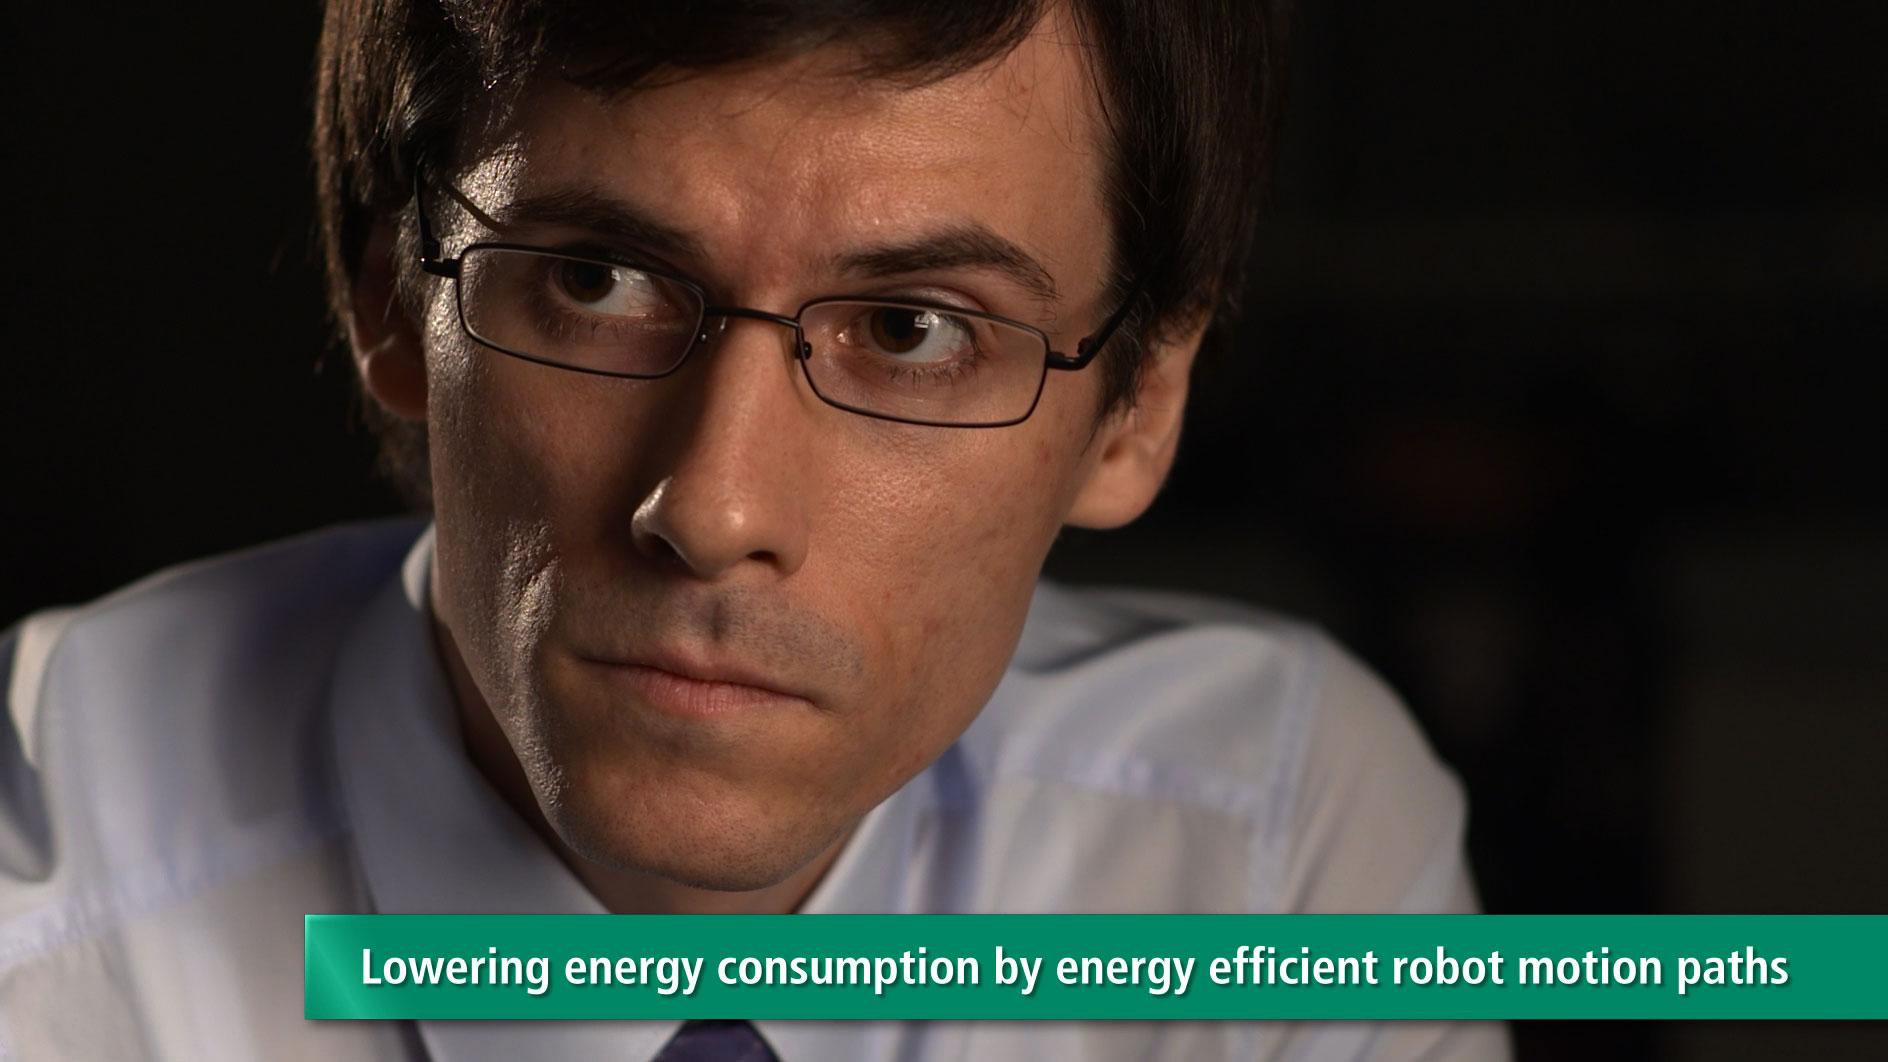 20130419_Siemens_Roboter_002.jpg